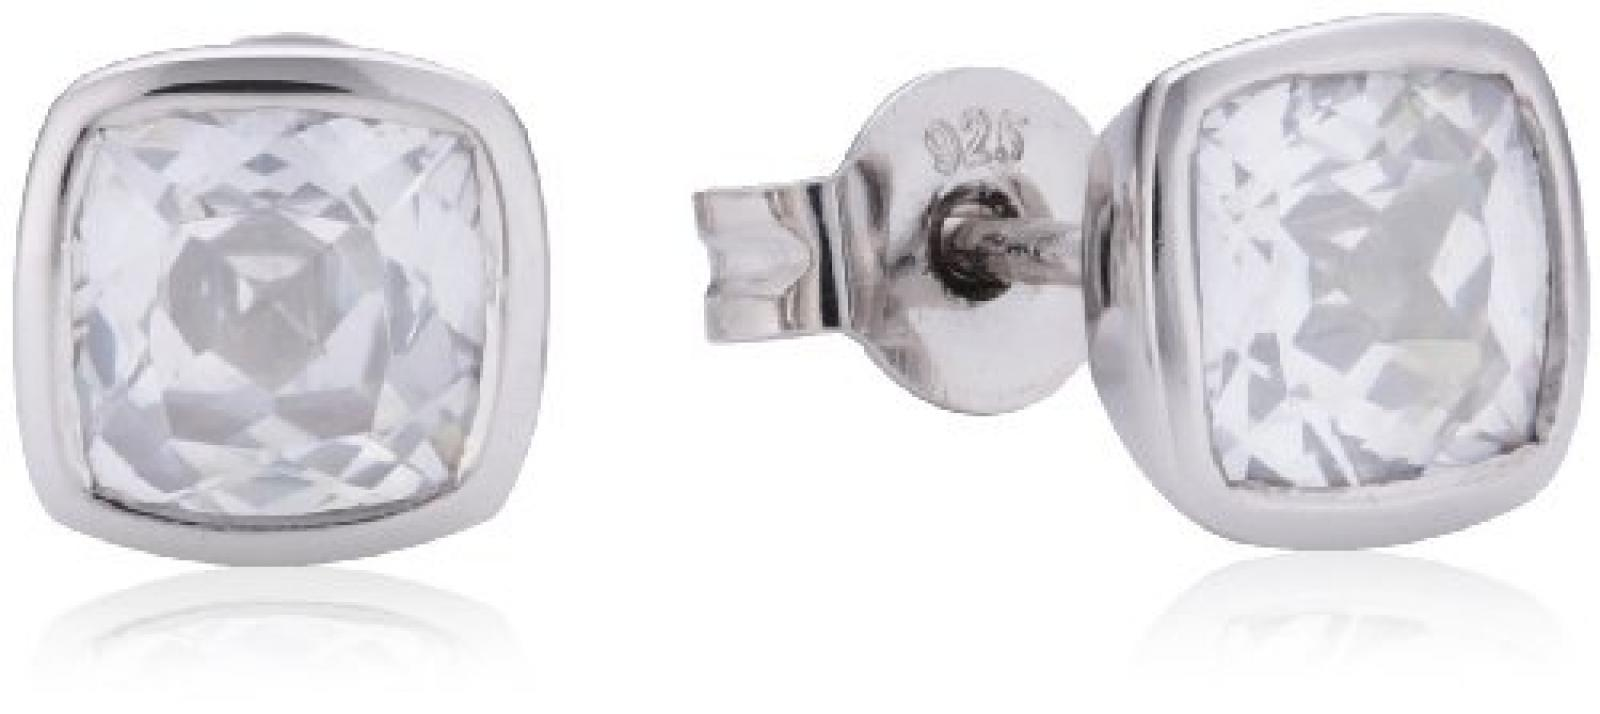 Viventy Damen-Ohrstecker 925 Sterling Silber mit 1 Zirkonia in weiss 764454